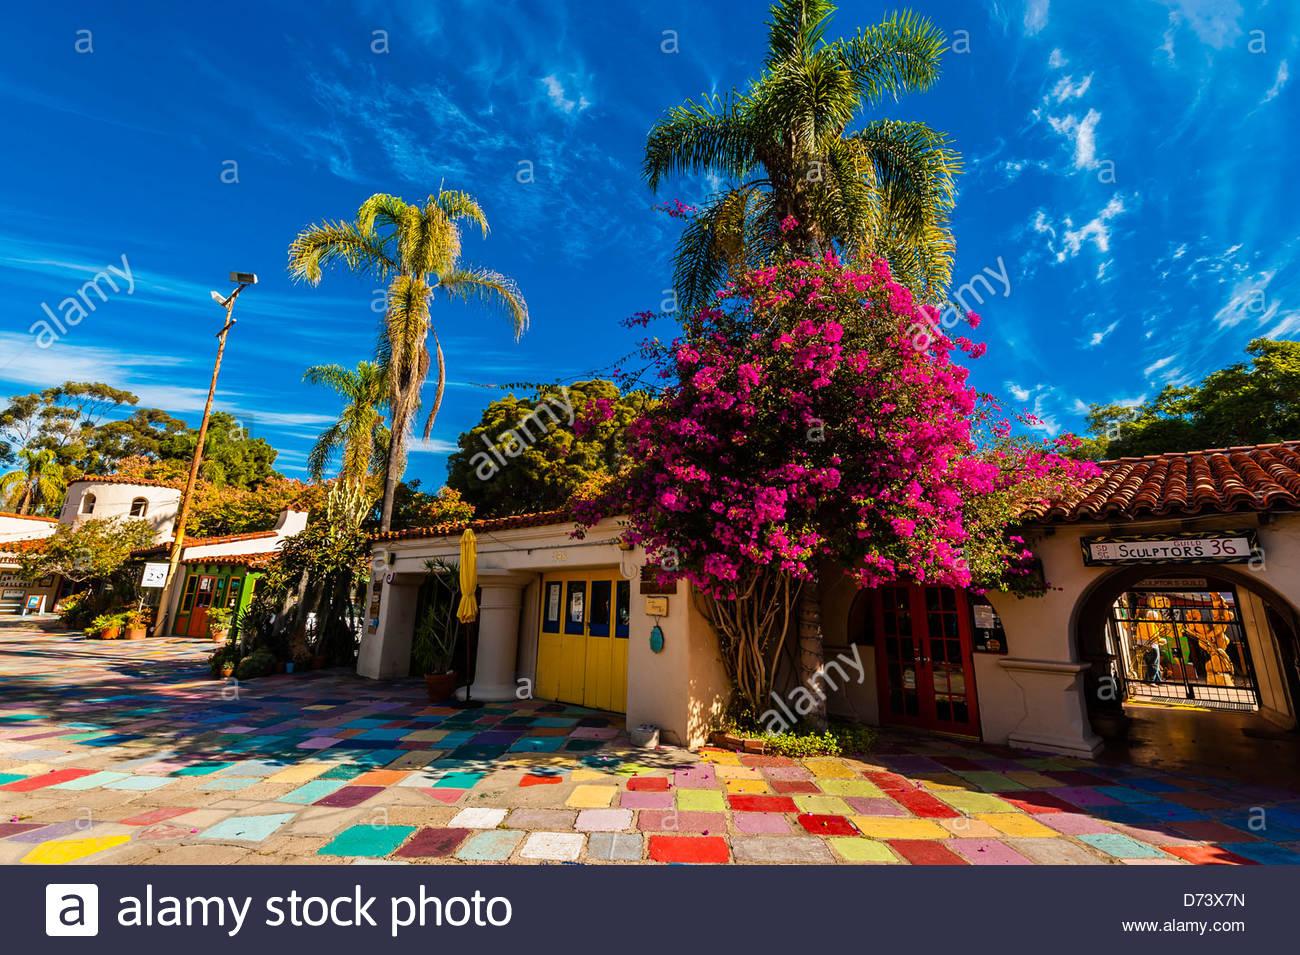 spanish village art center, balboa park, san diego, california usa